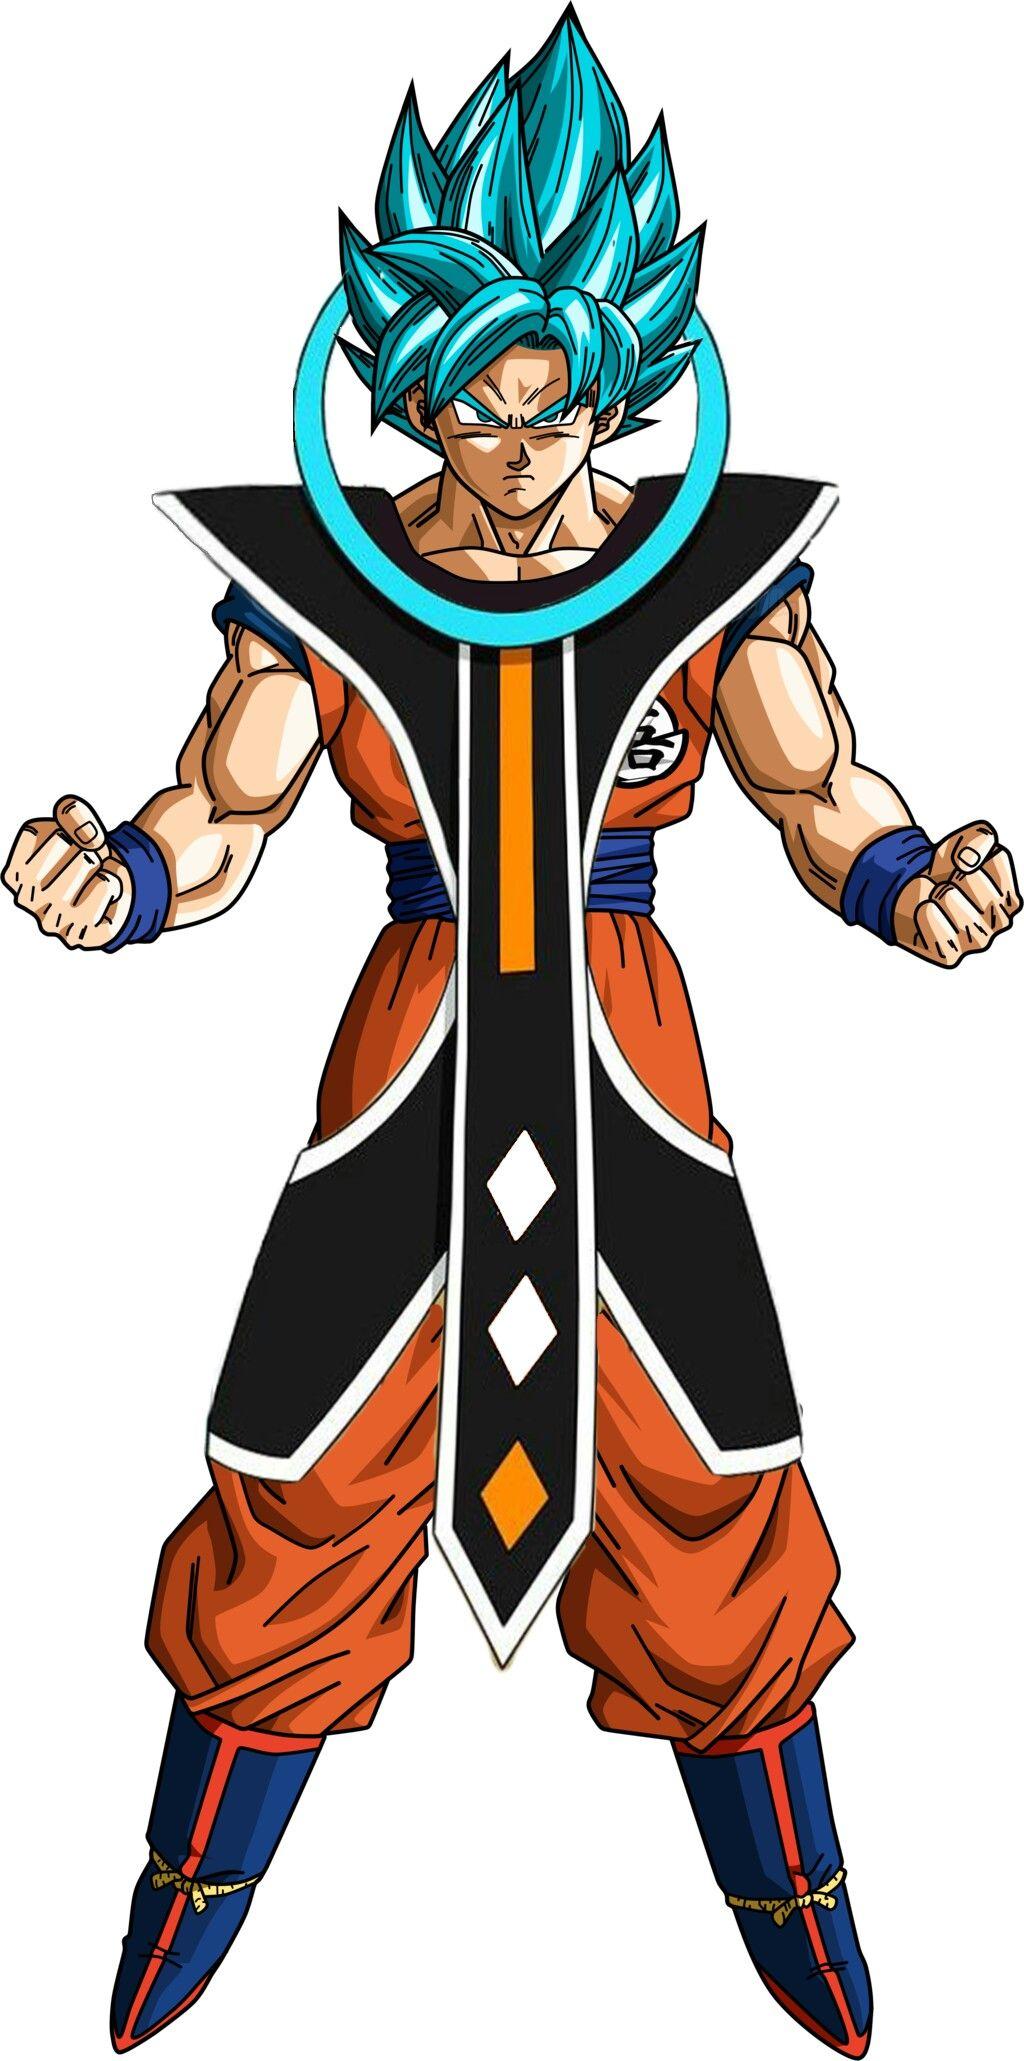 Goku ssj2 angel